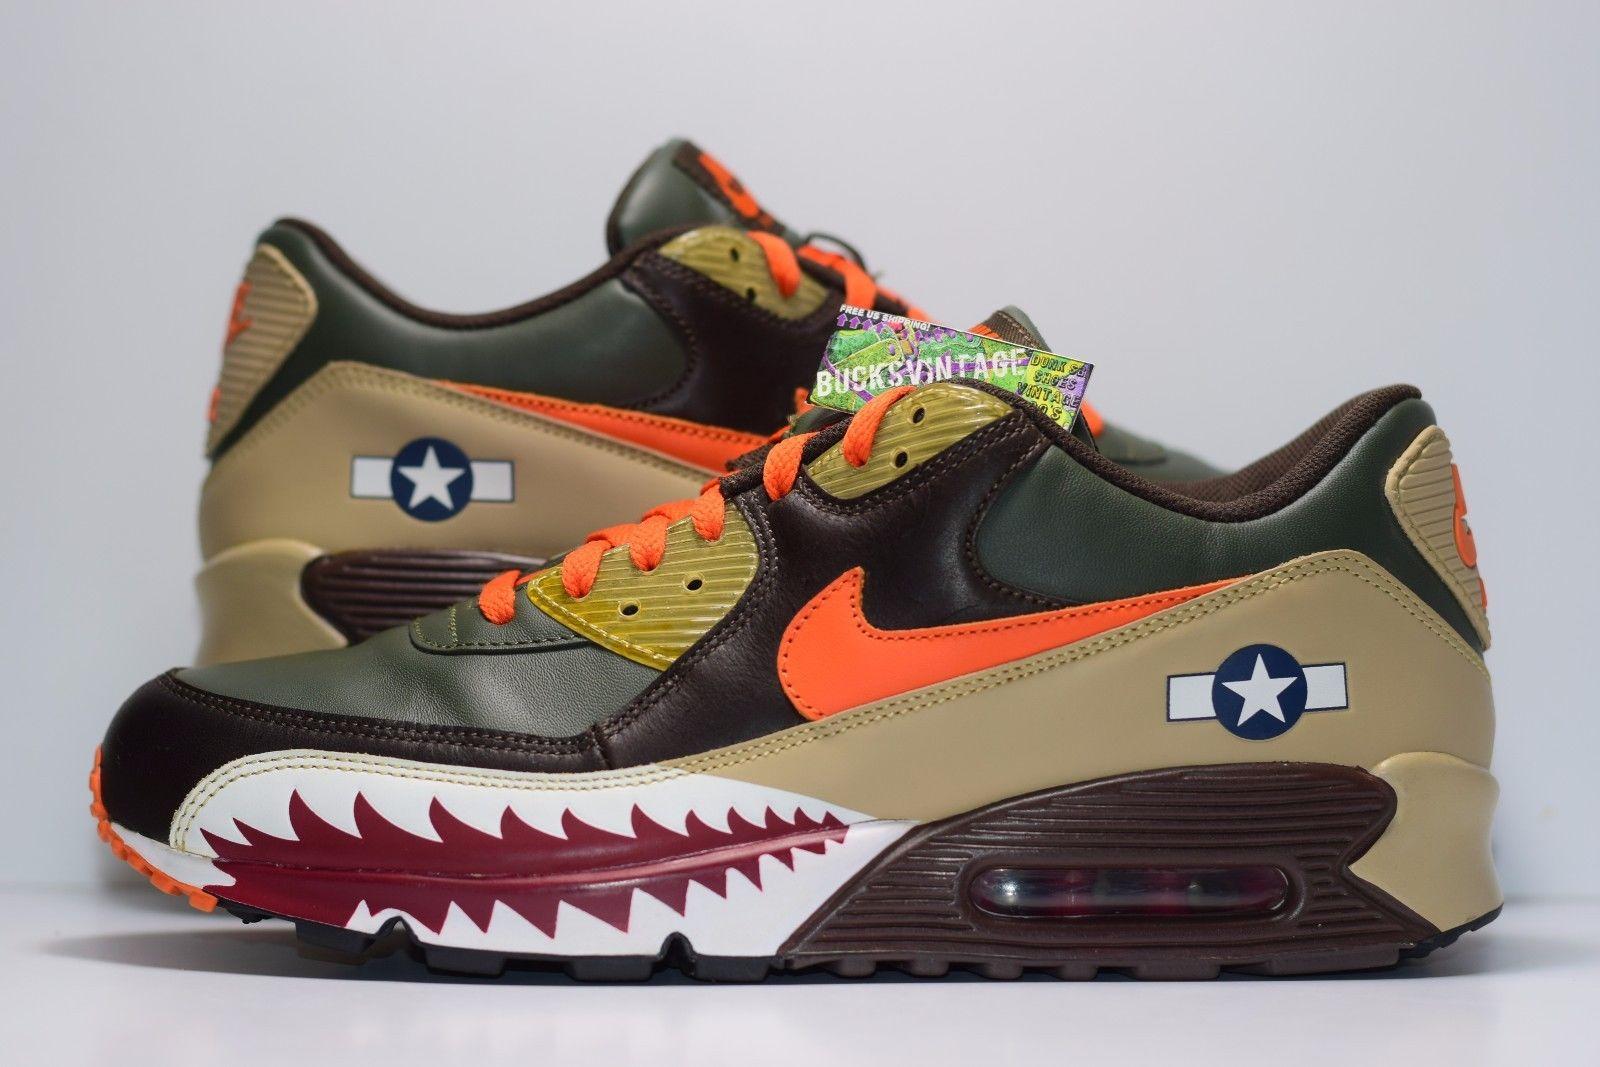 5a2def9a081 Size 11 | 2007 Nike Air Max 90 Premium Warhawk 315728-381 on Storenvy